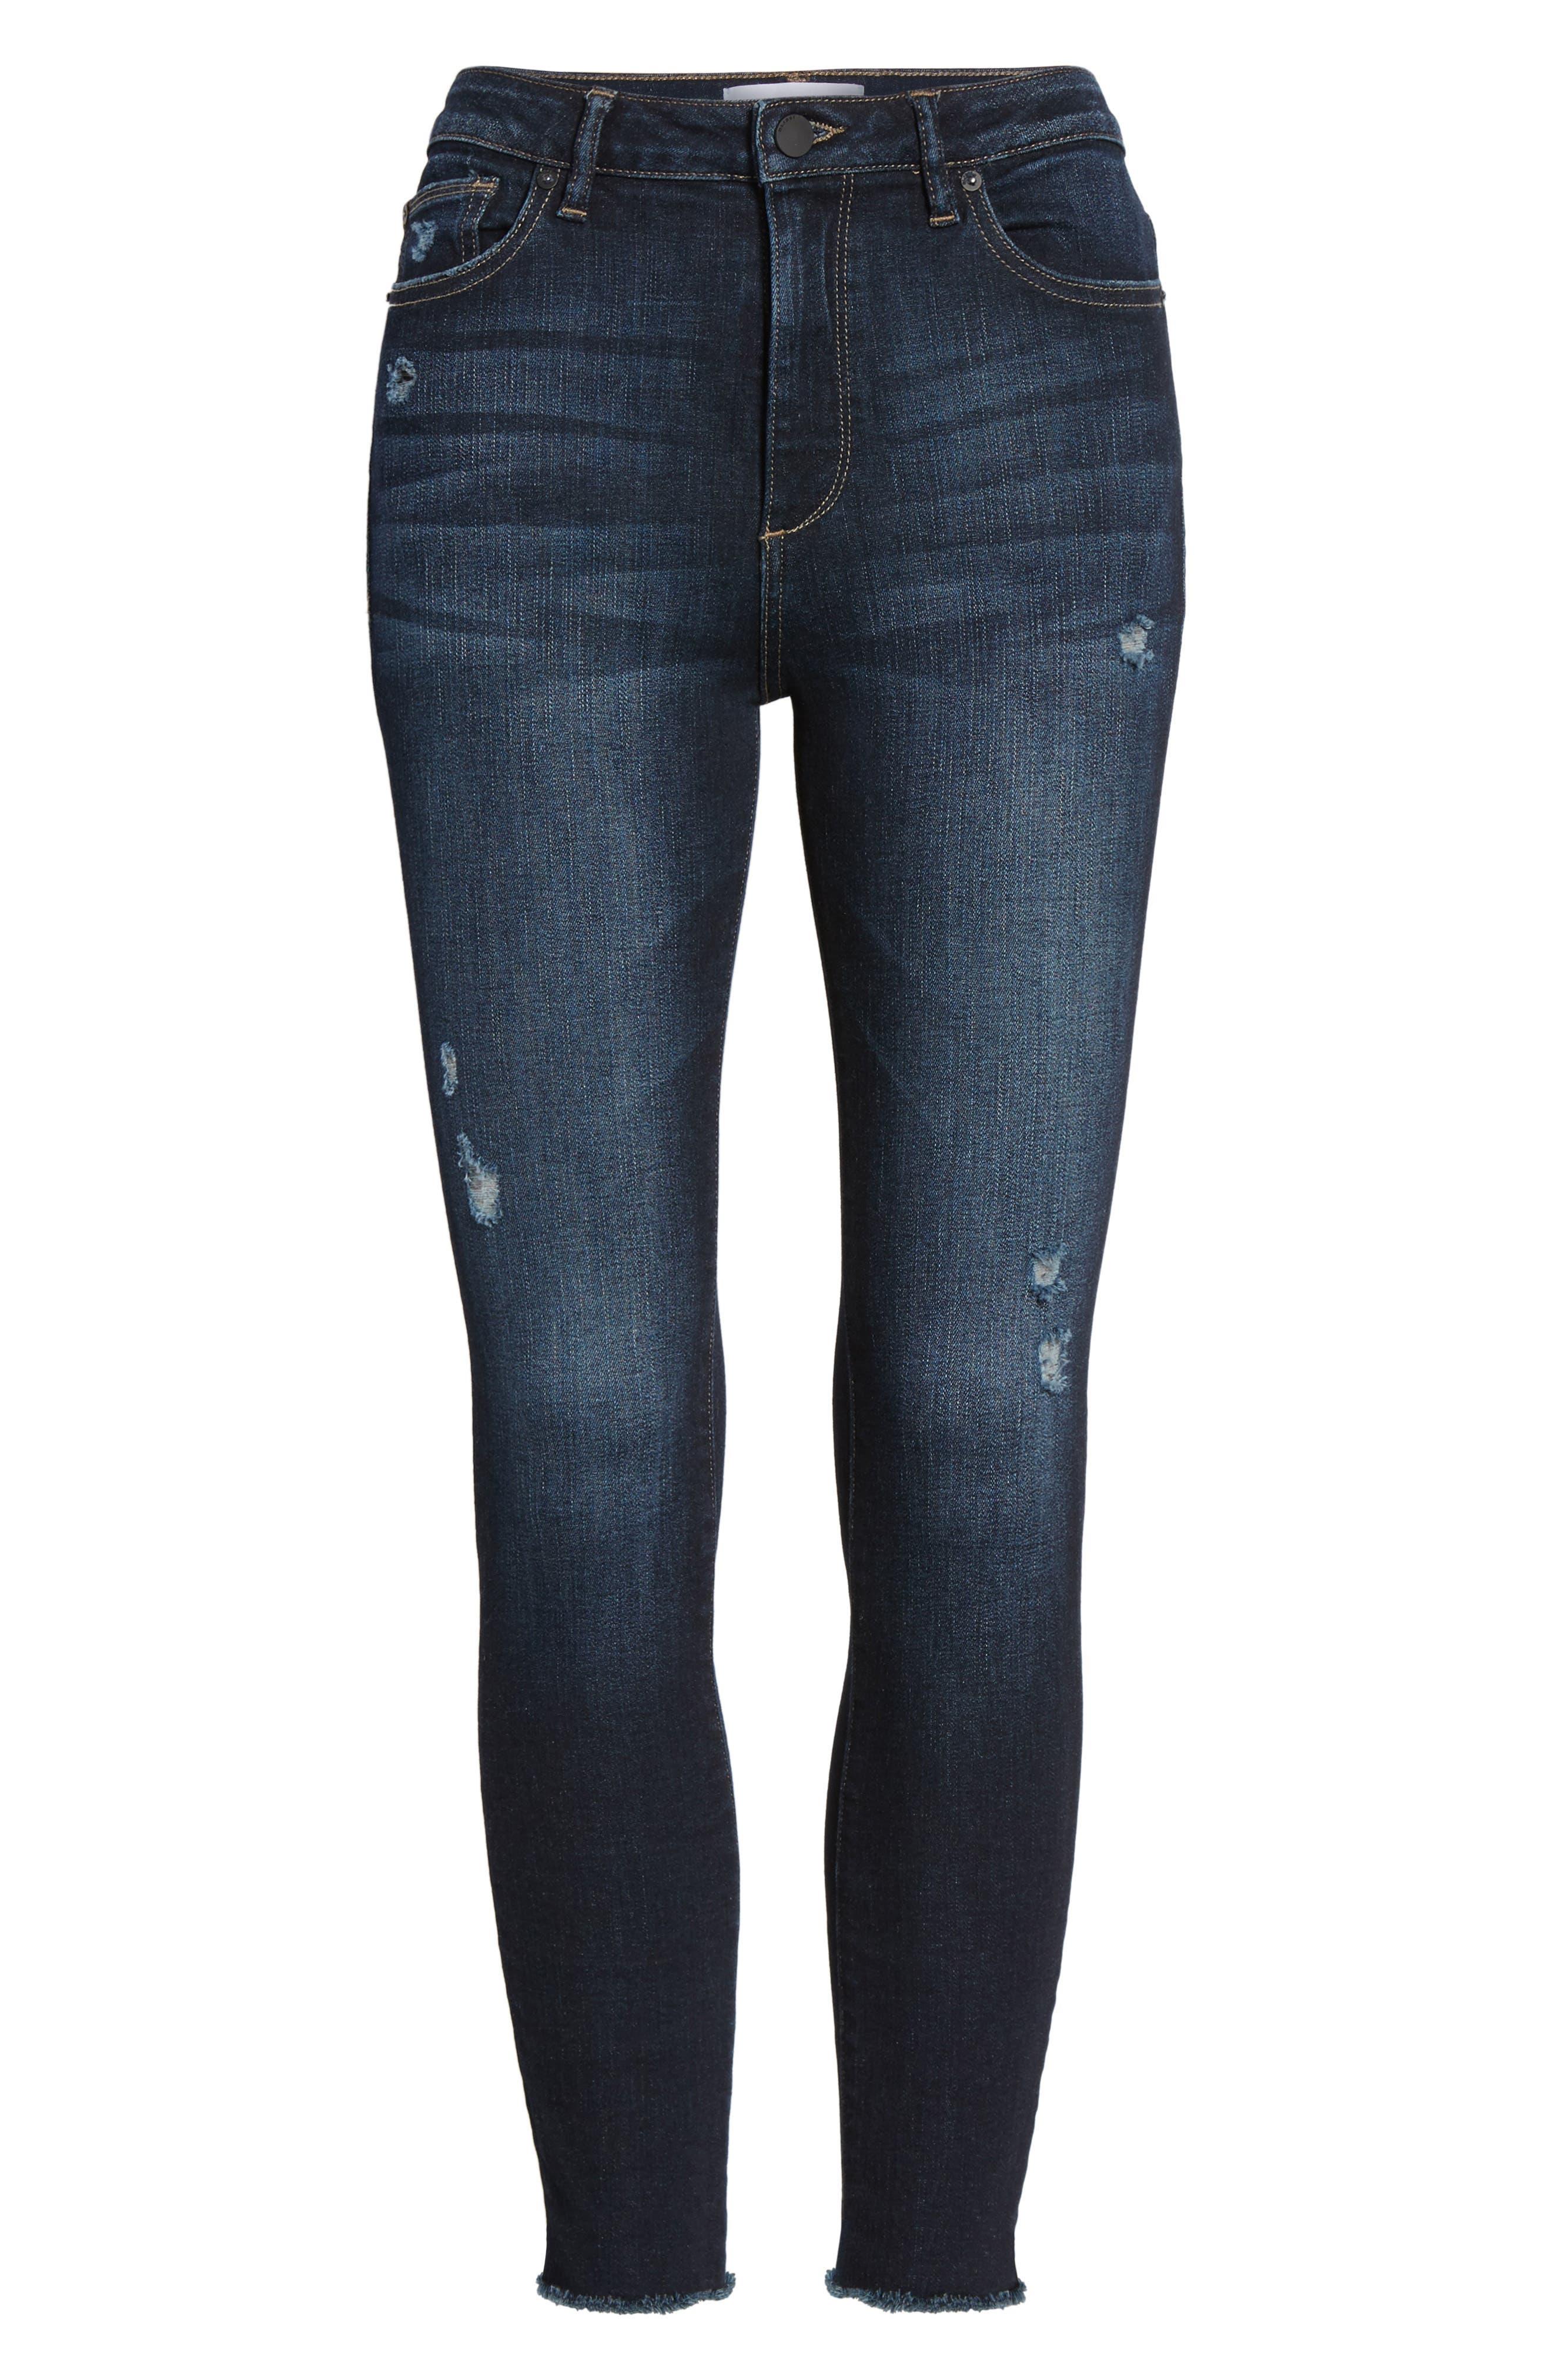 Chrissy High Waist Crop Skinny Jeans,                             Alternate thumbnail 6, color,                             Trinity